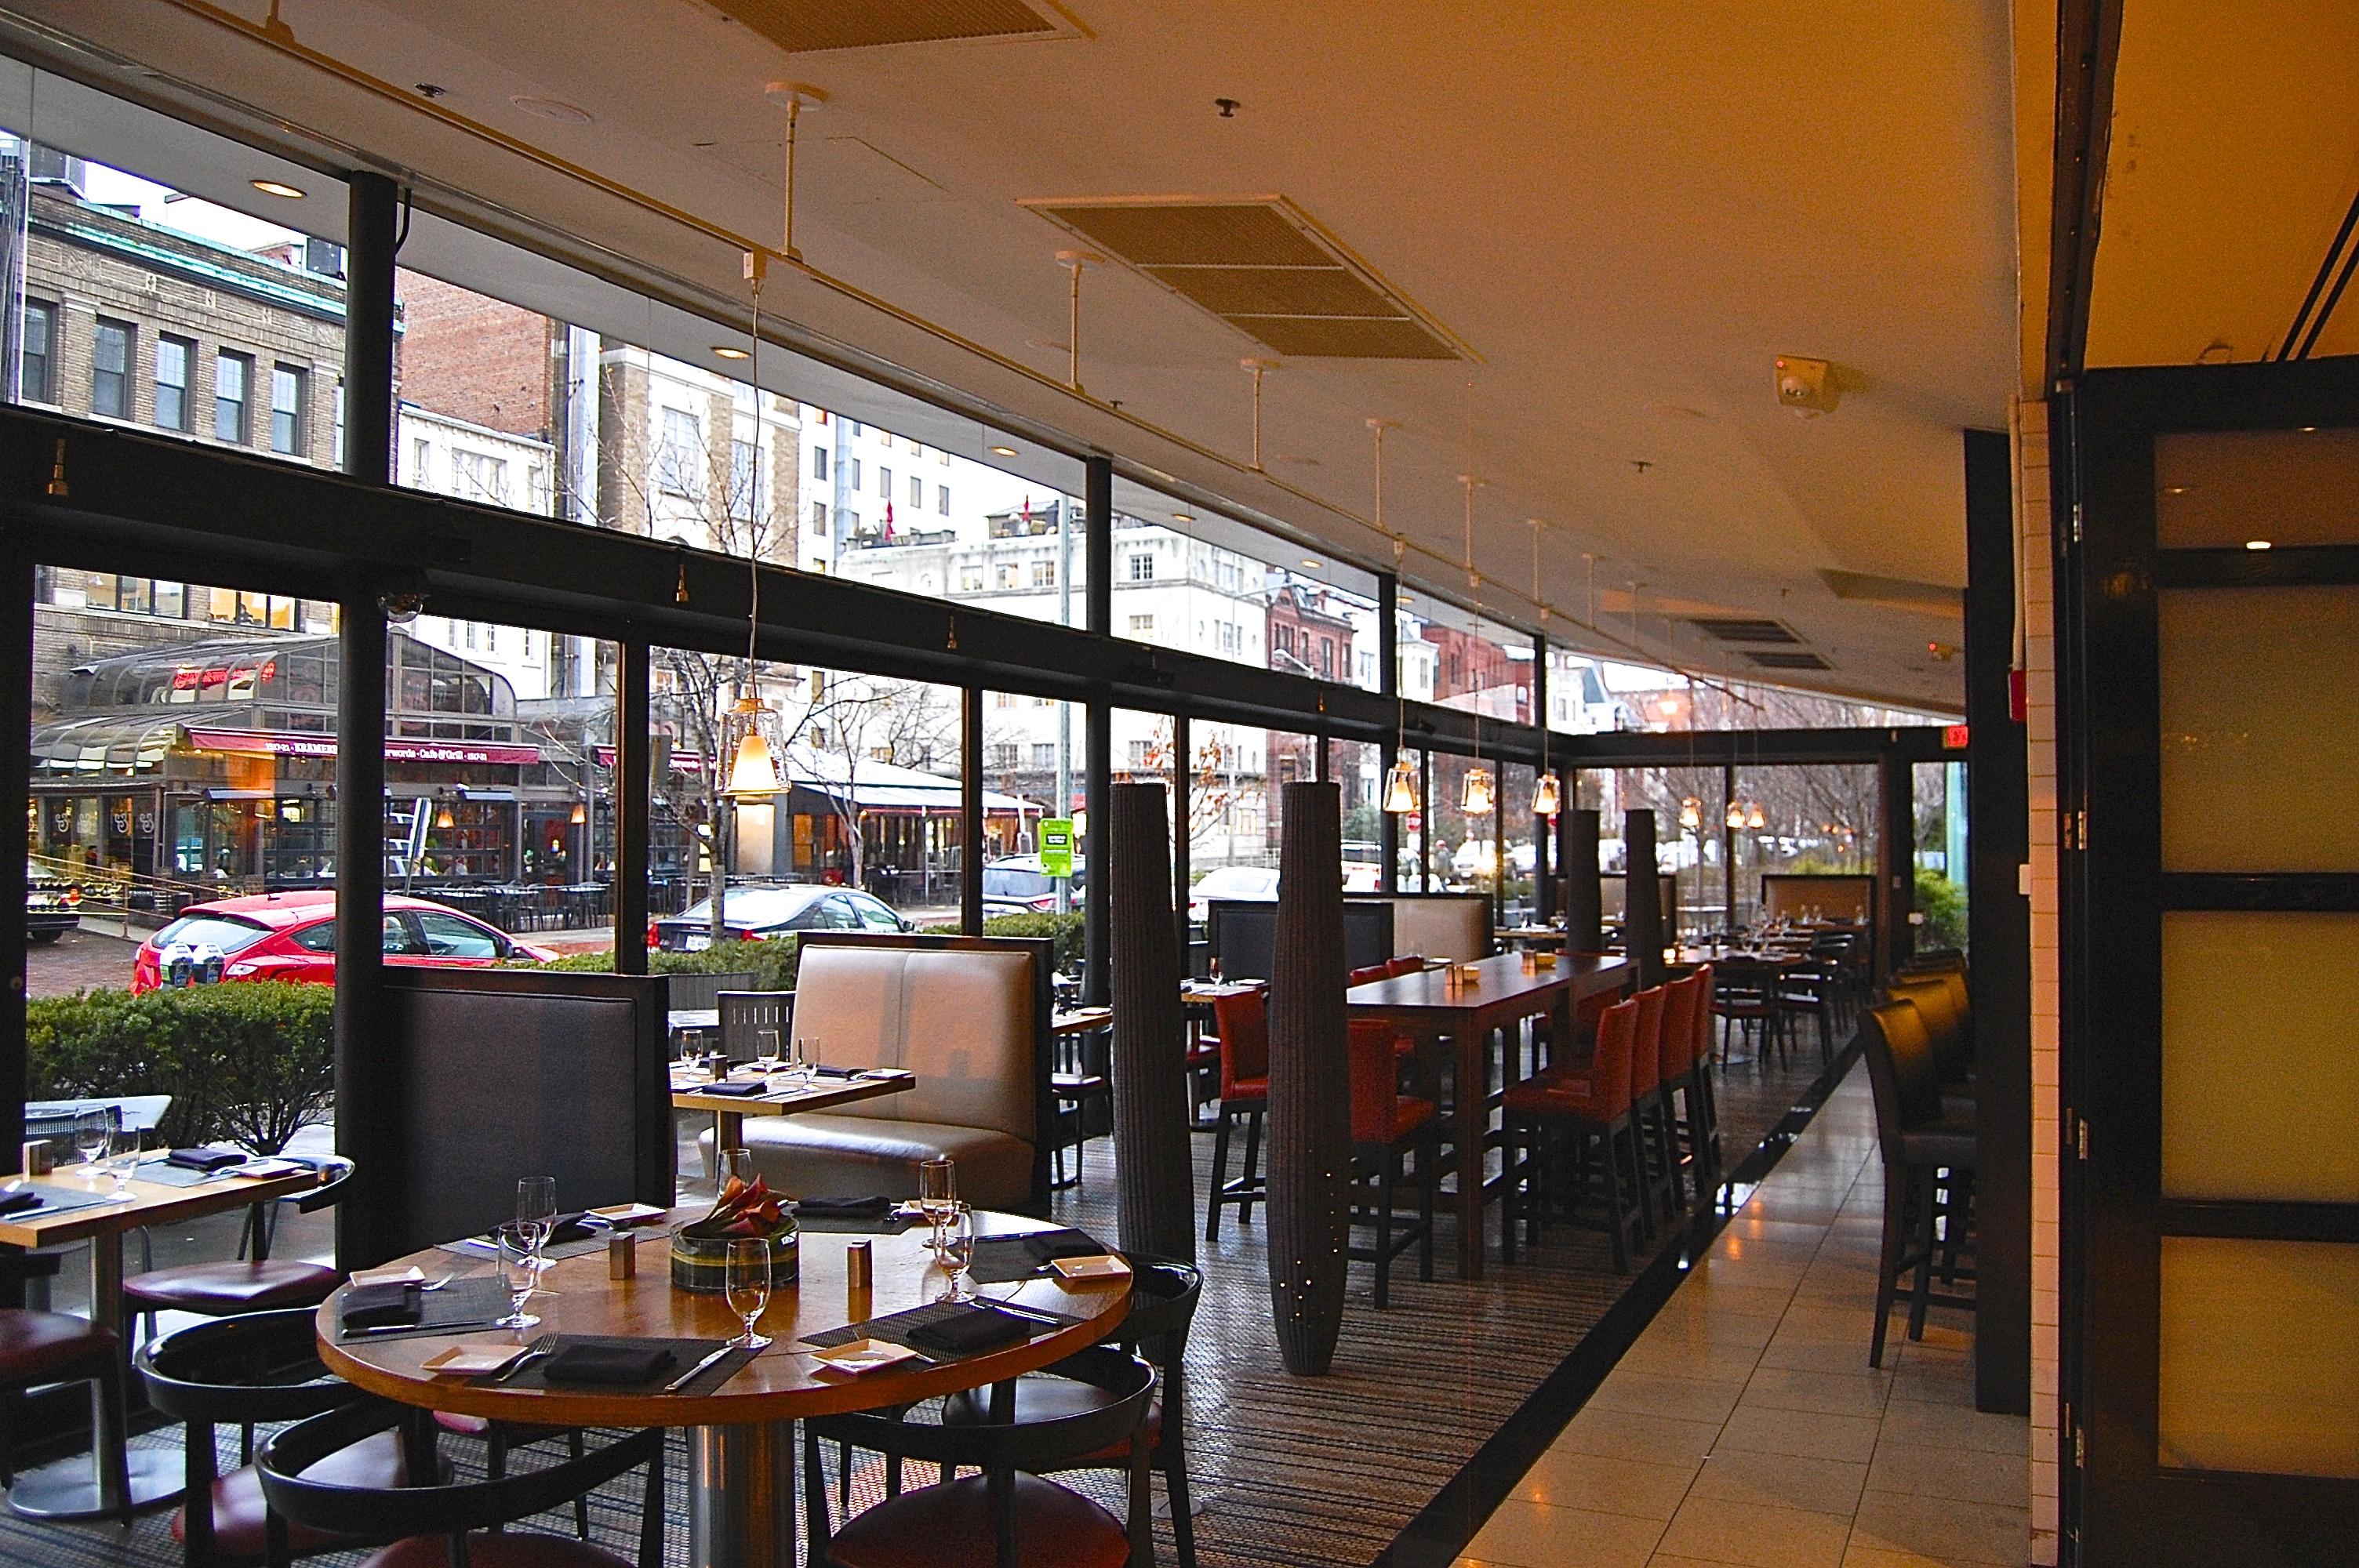 The 10 Best Restaurants Near The Dupont Circle TripAdvisor